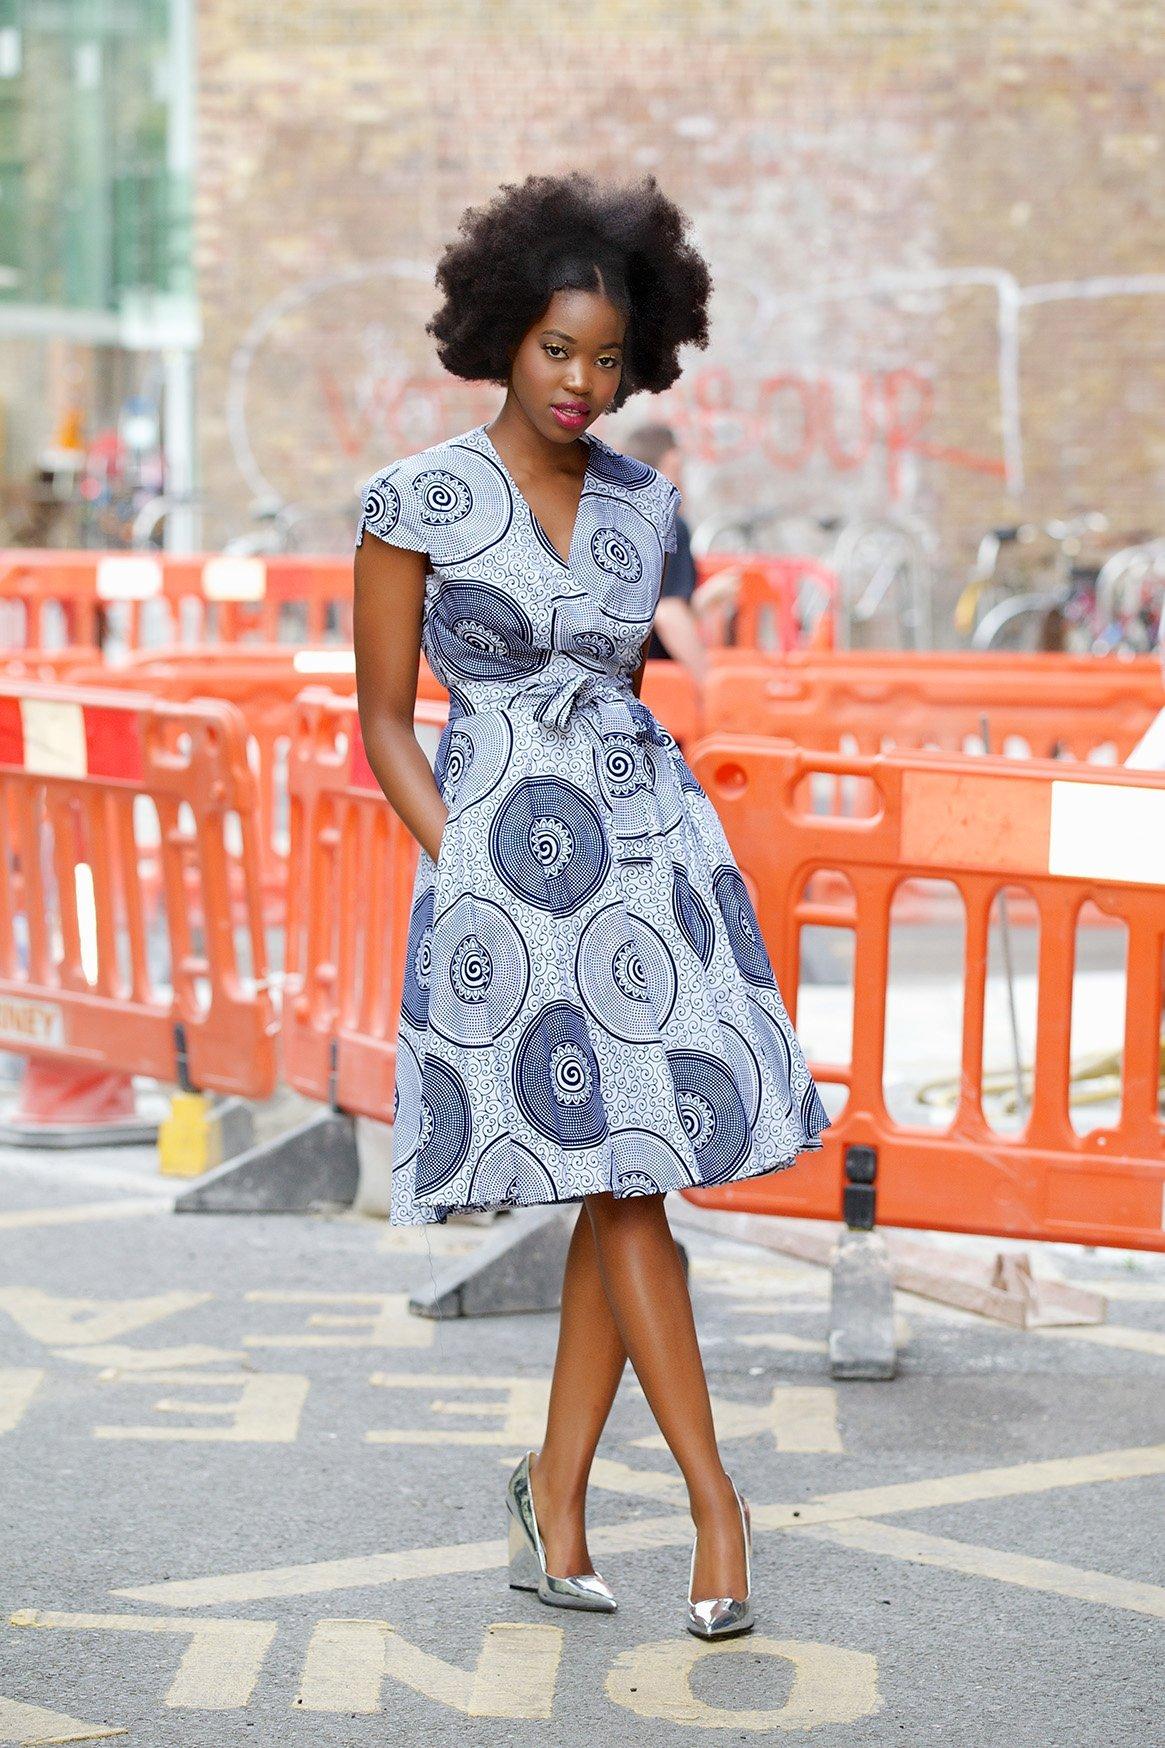 Ankara wrap dress / wax print dress / wrap dress / African print dress - Queen indigo print dress